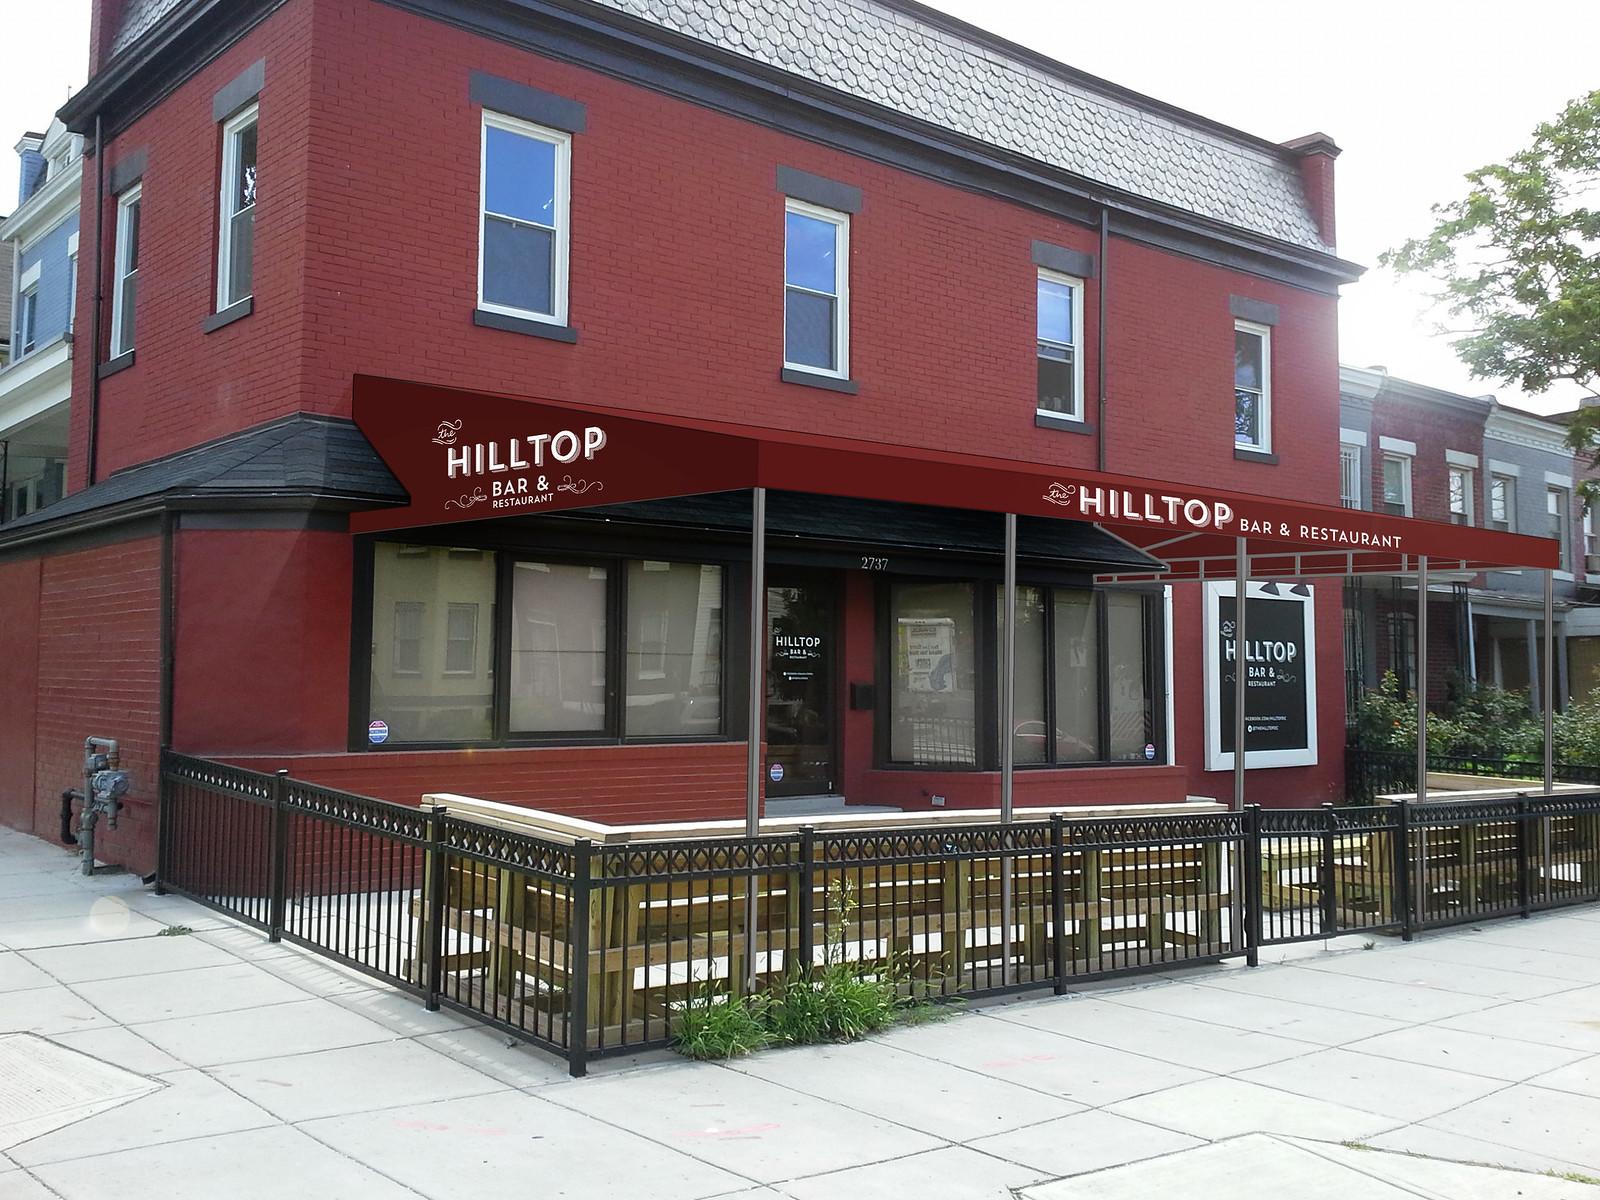 Hilltop Bar & Restaurant Rendering